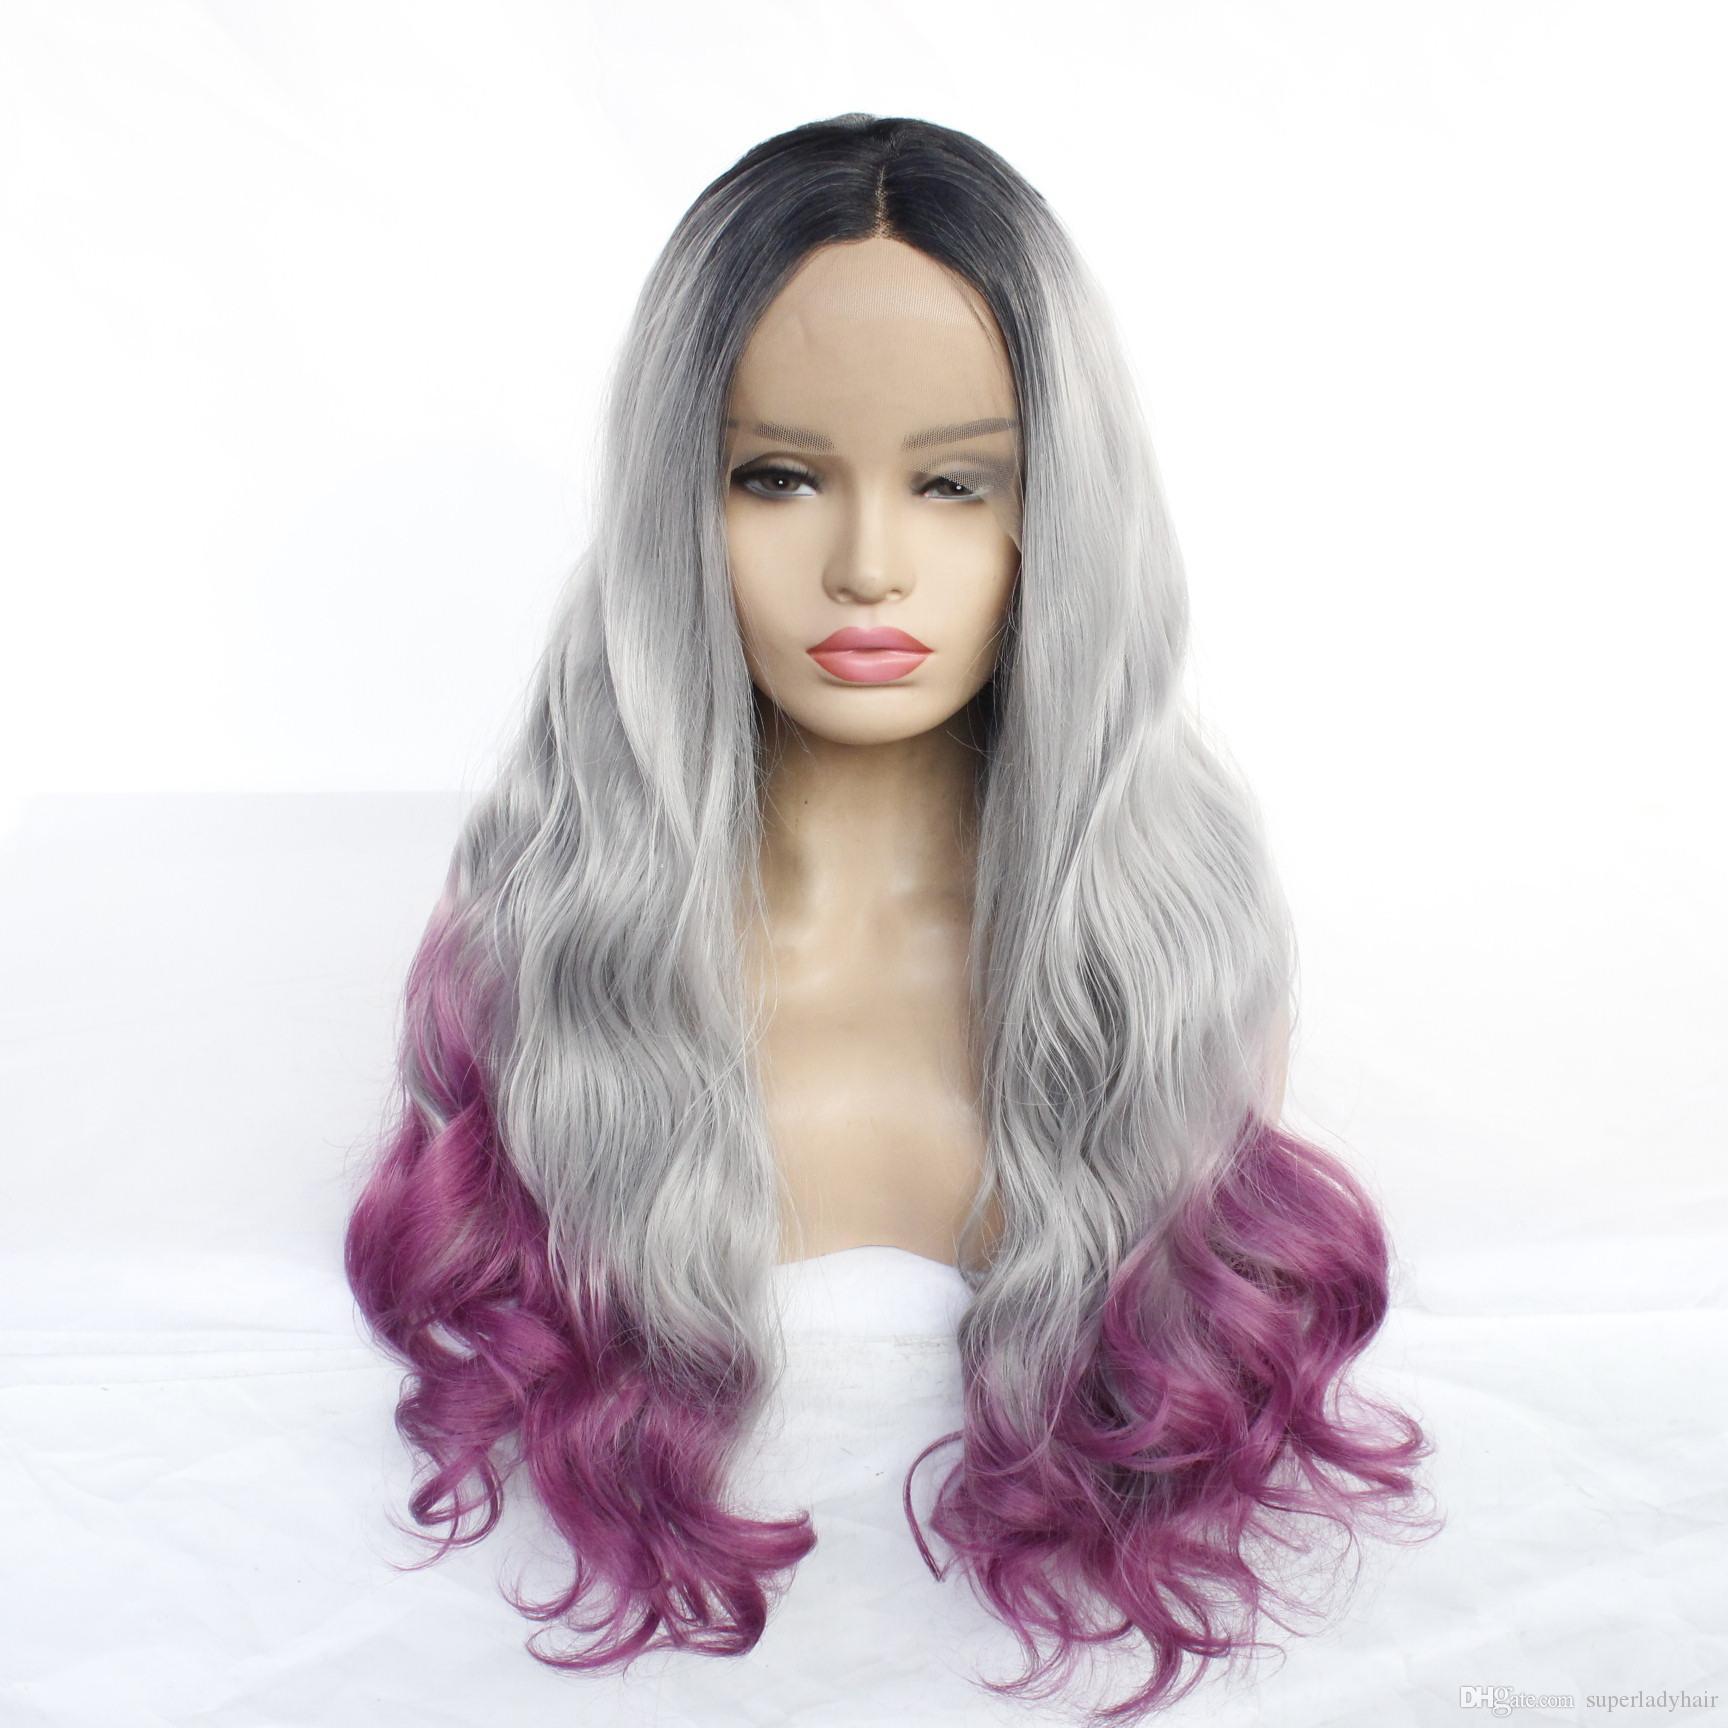 Natural onda teñido peluca negro gris púrpura sintético gradiente de tres colores pelucas de pelo ombre color del frente medio de encaje postizos peluca mano-atadas